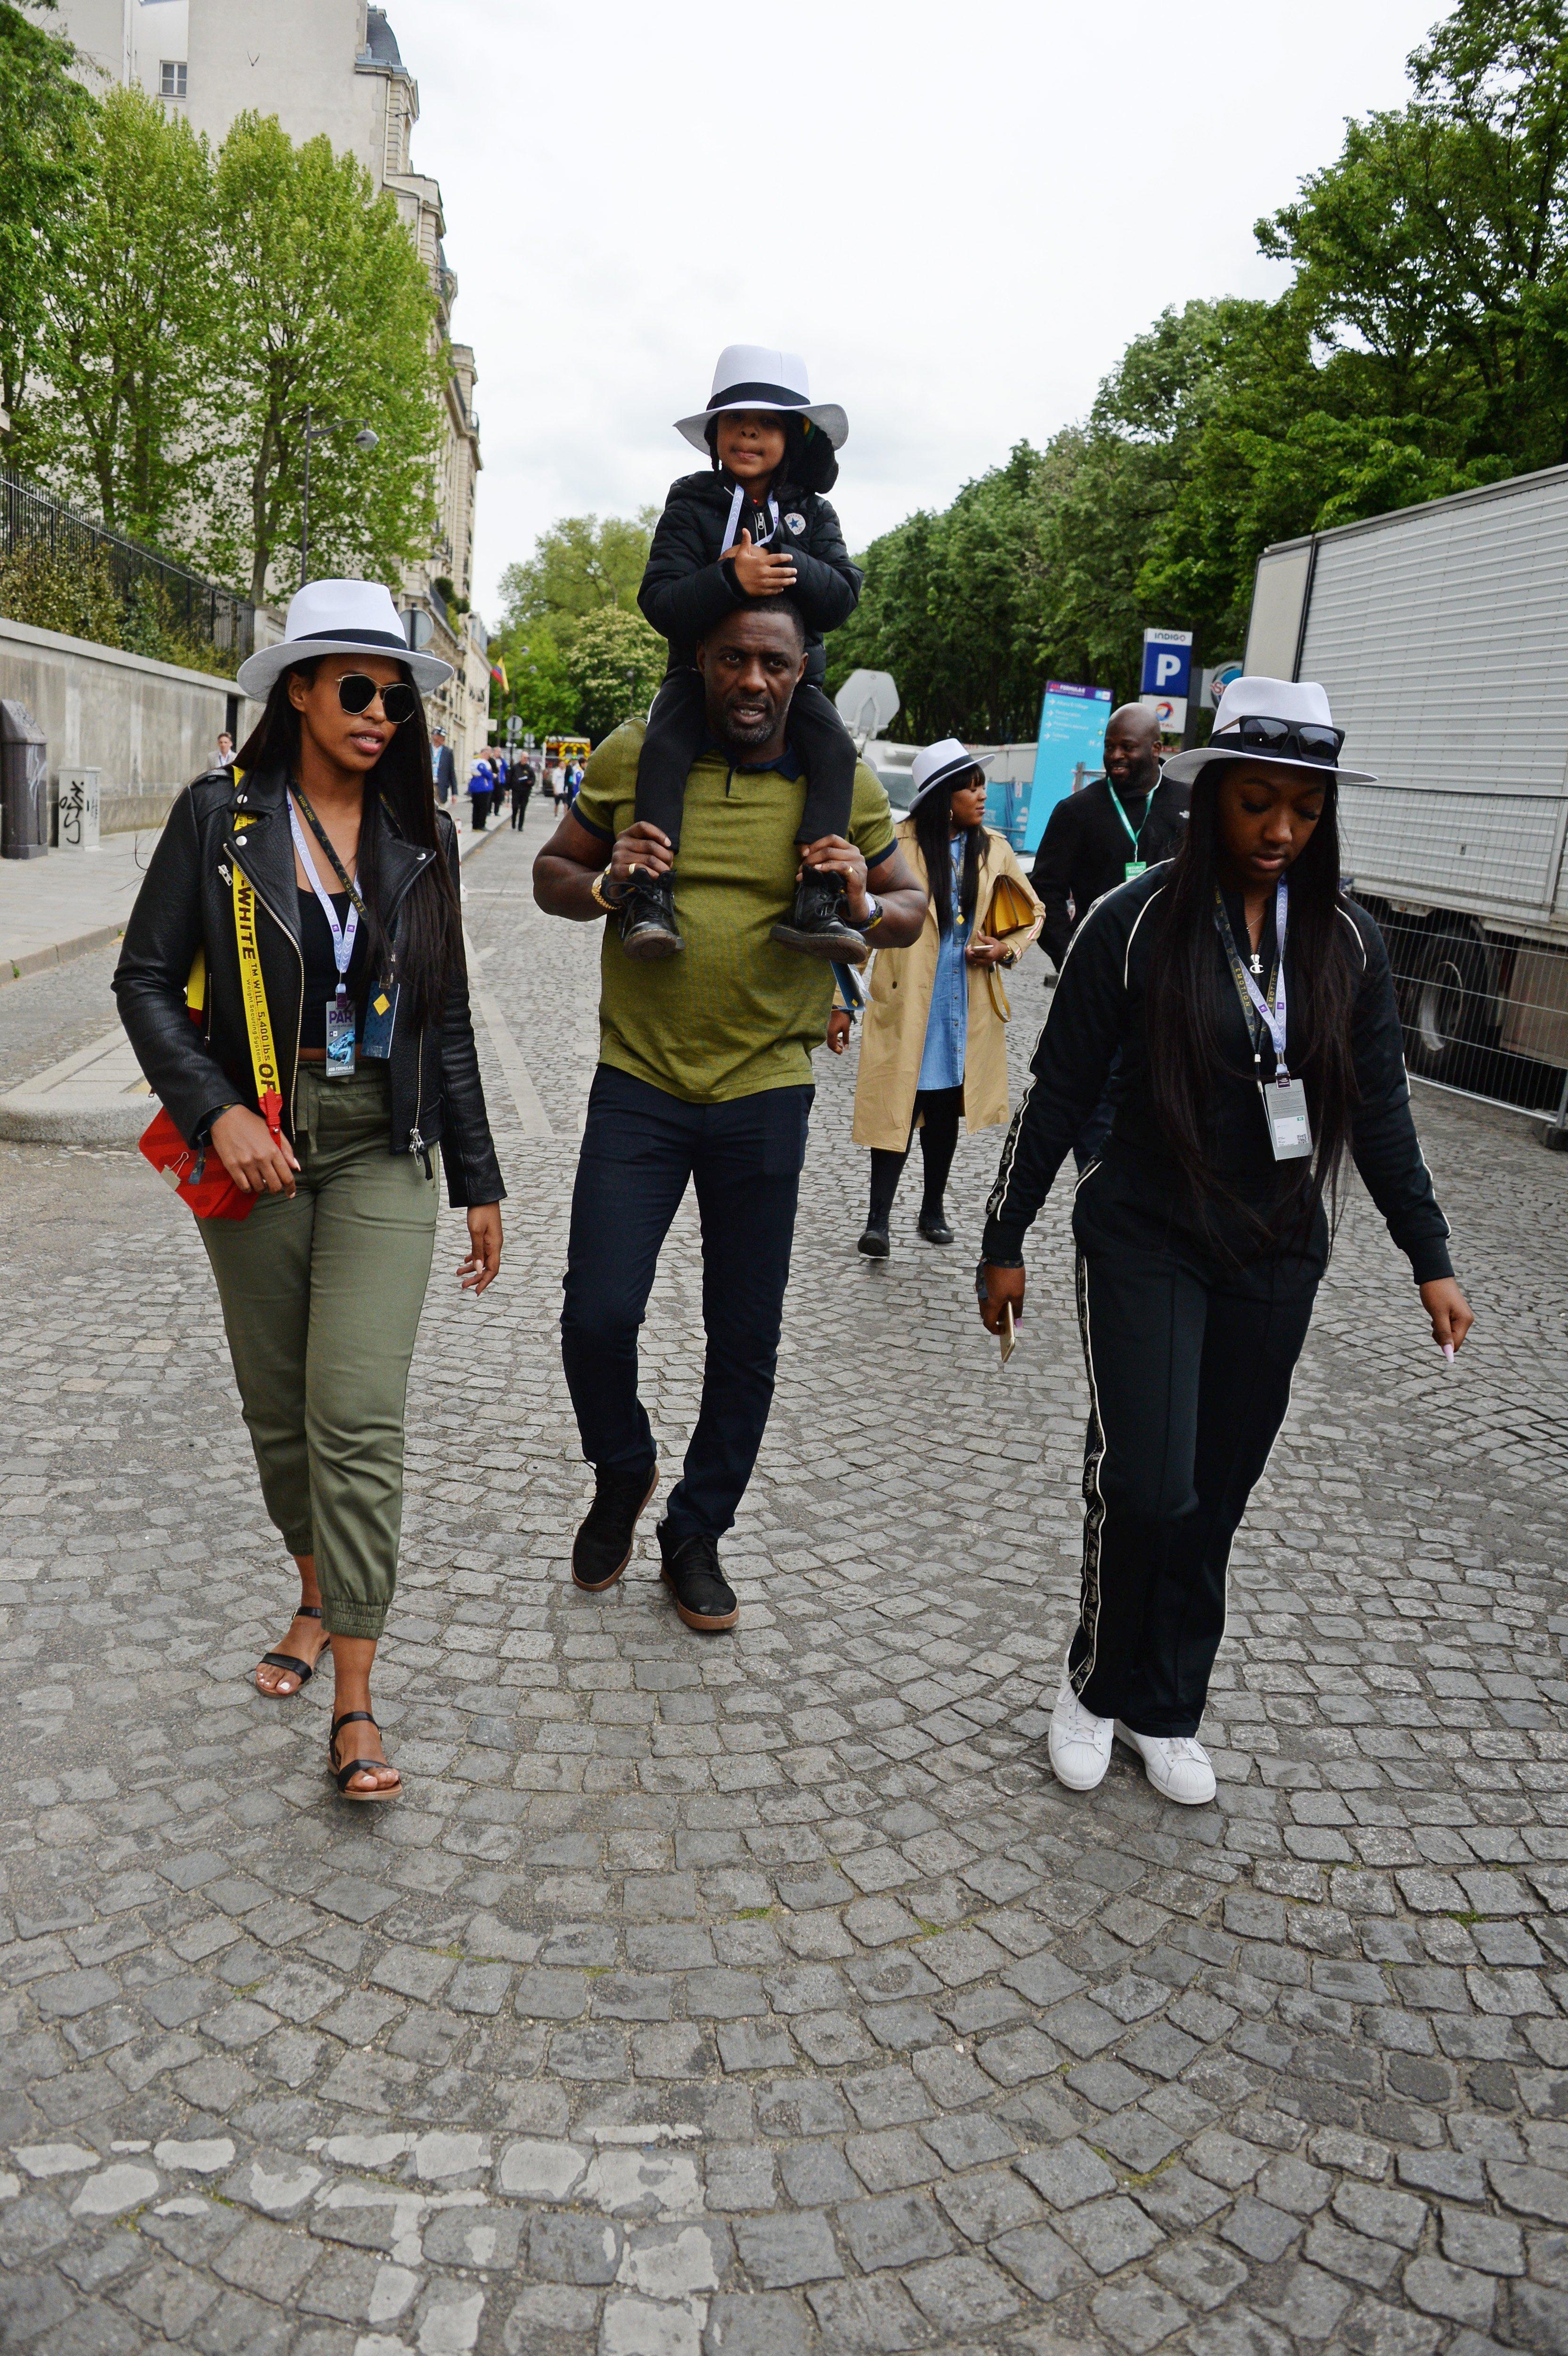 (L-R) Sabrina Elba, Idris Elba, son Winston Elba & daughter Isan Elba at the ABB FIA Formula E Qatar Airways Paris E-Prix in Paris on Apr. 28, 2018.  Photo: Getty Images